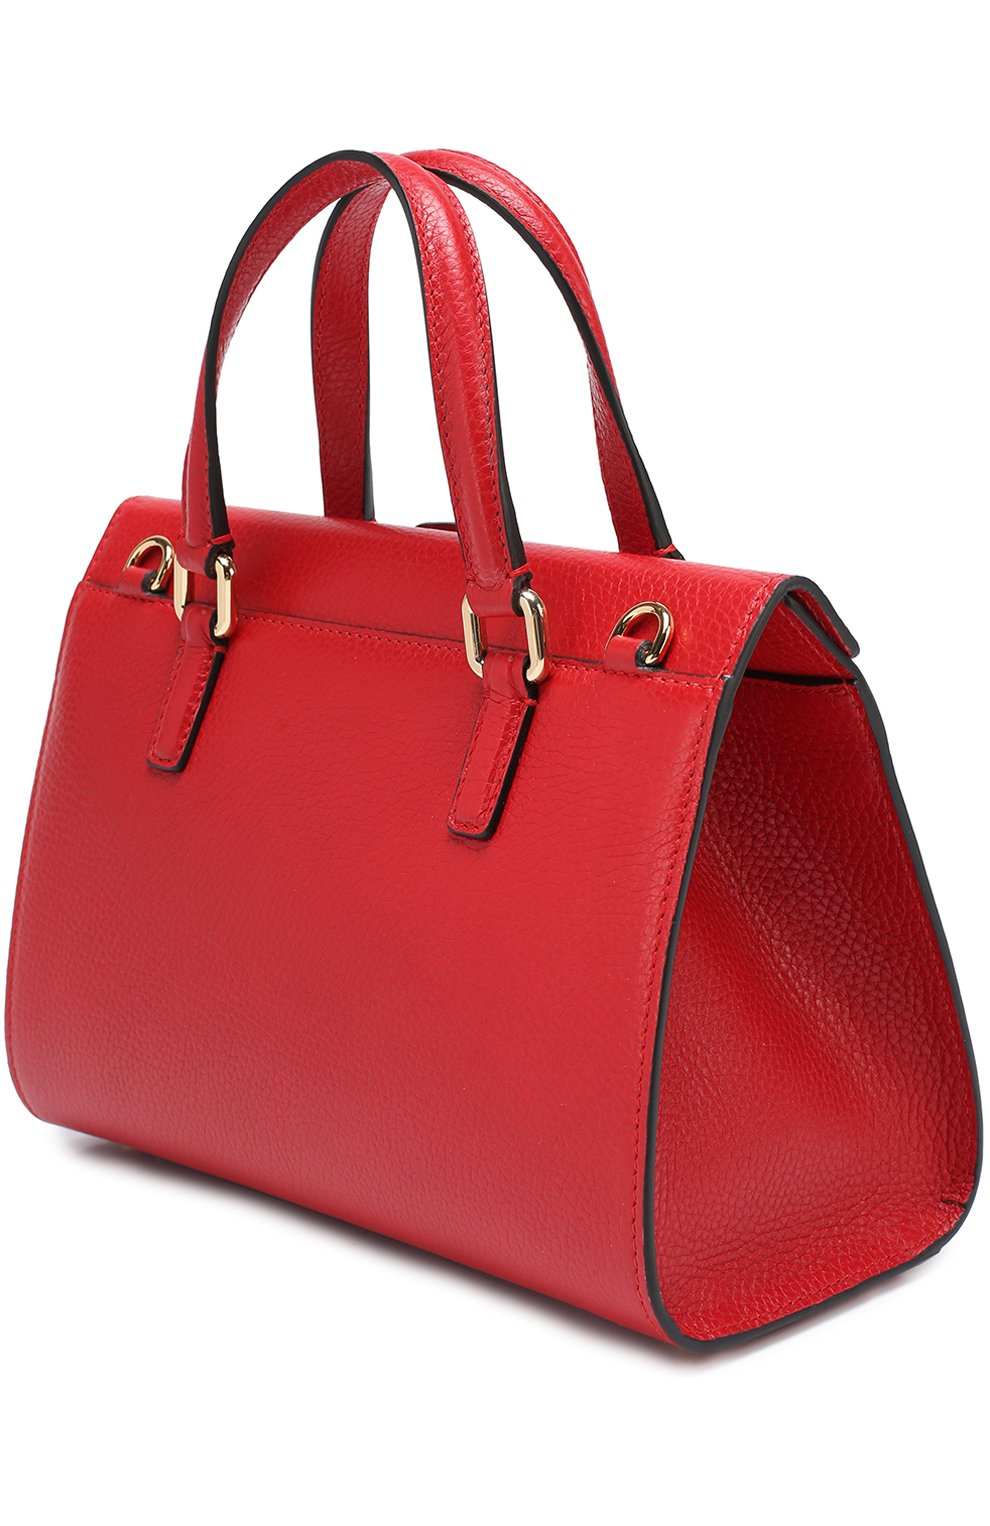 Сумка Dolce Lady Dolce & Gabbana красная цвета   Фото №3